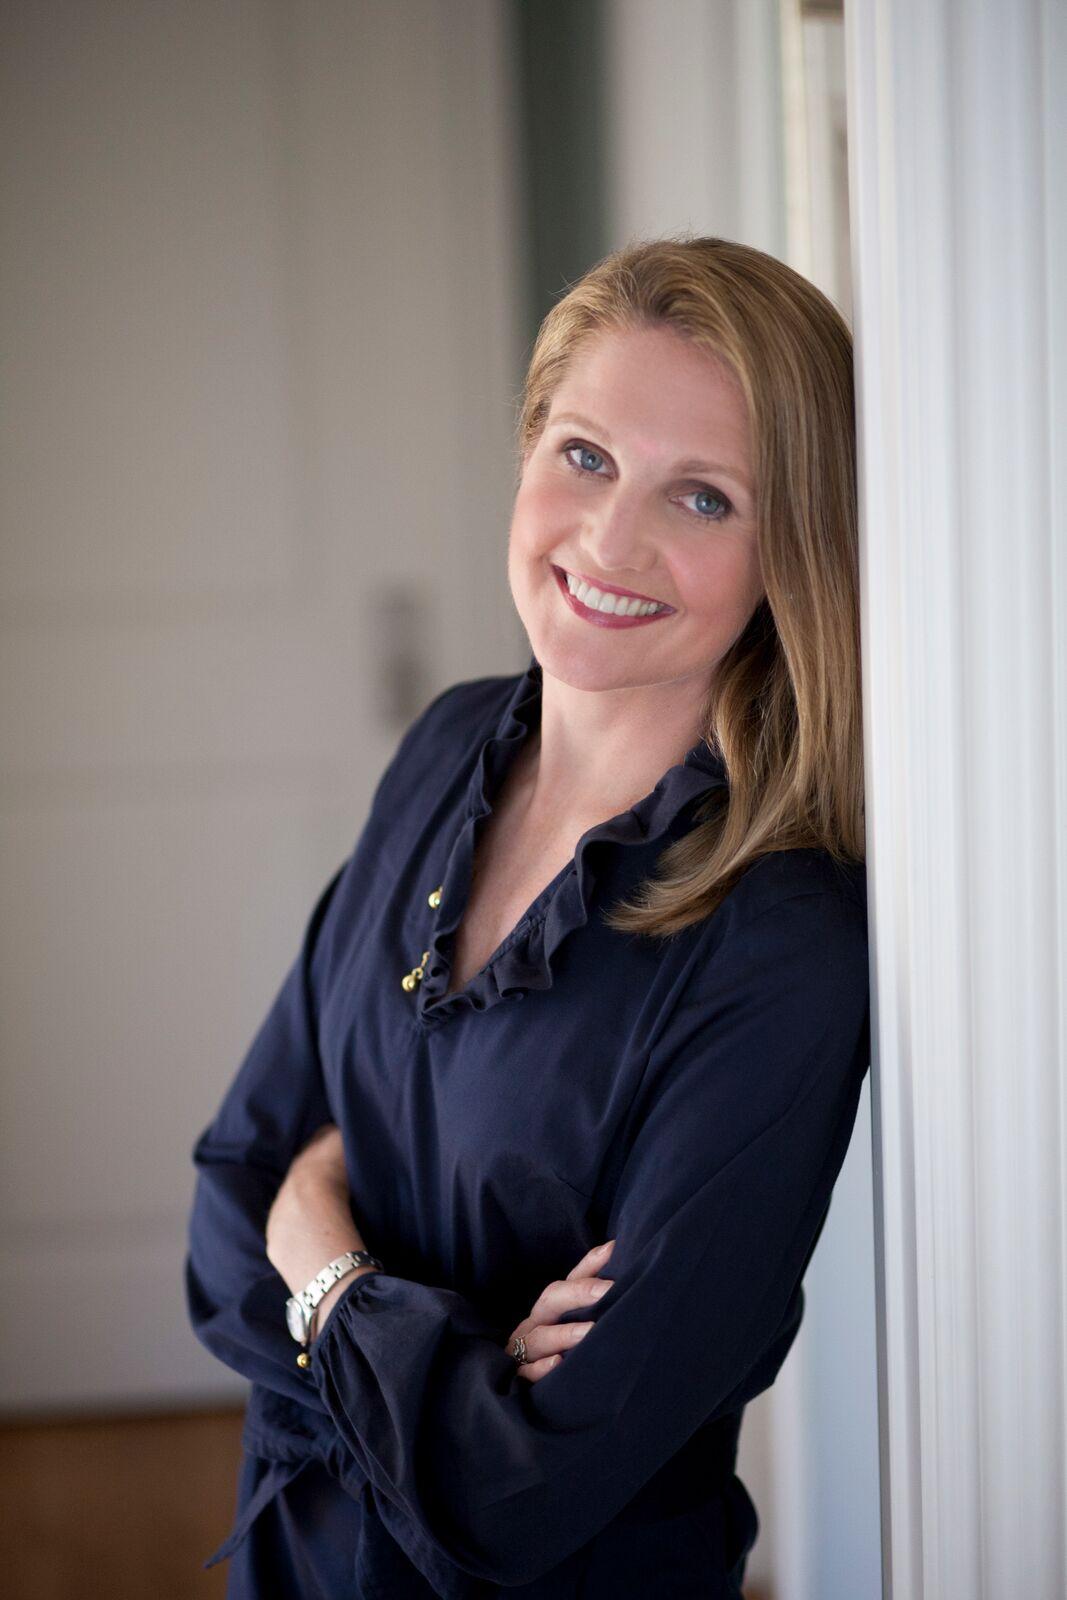 Ann Lowengart